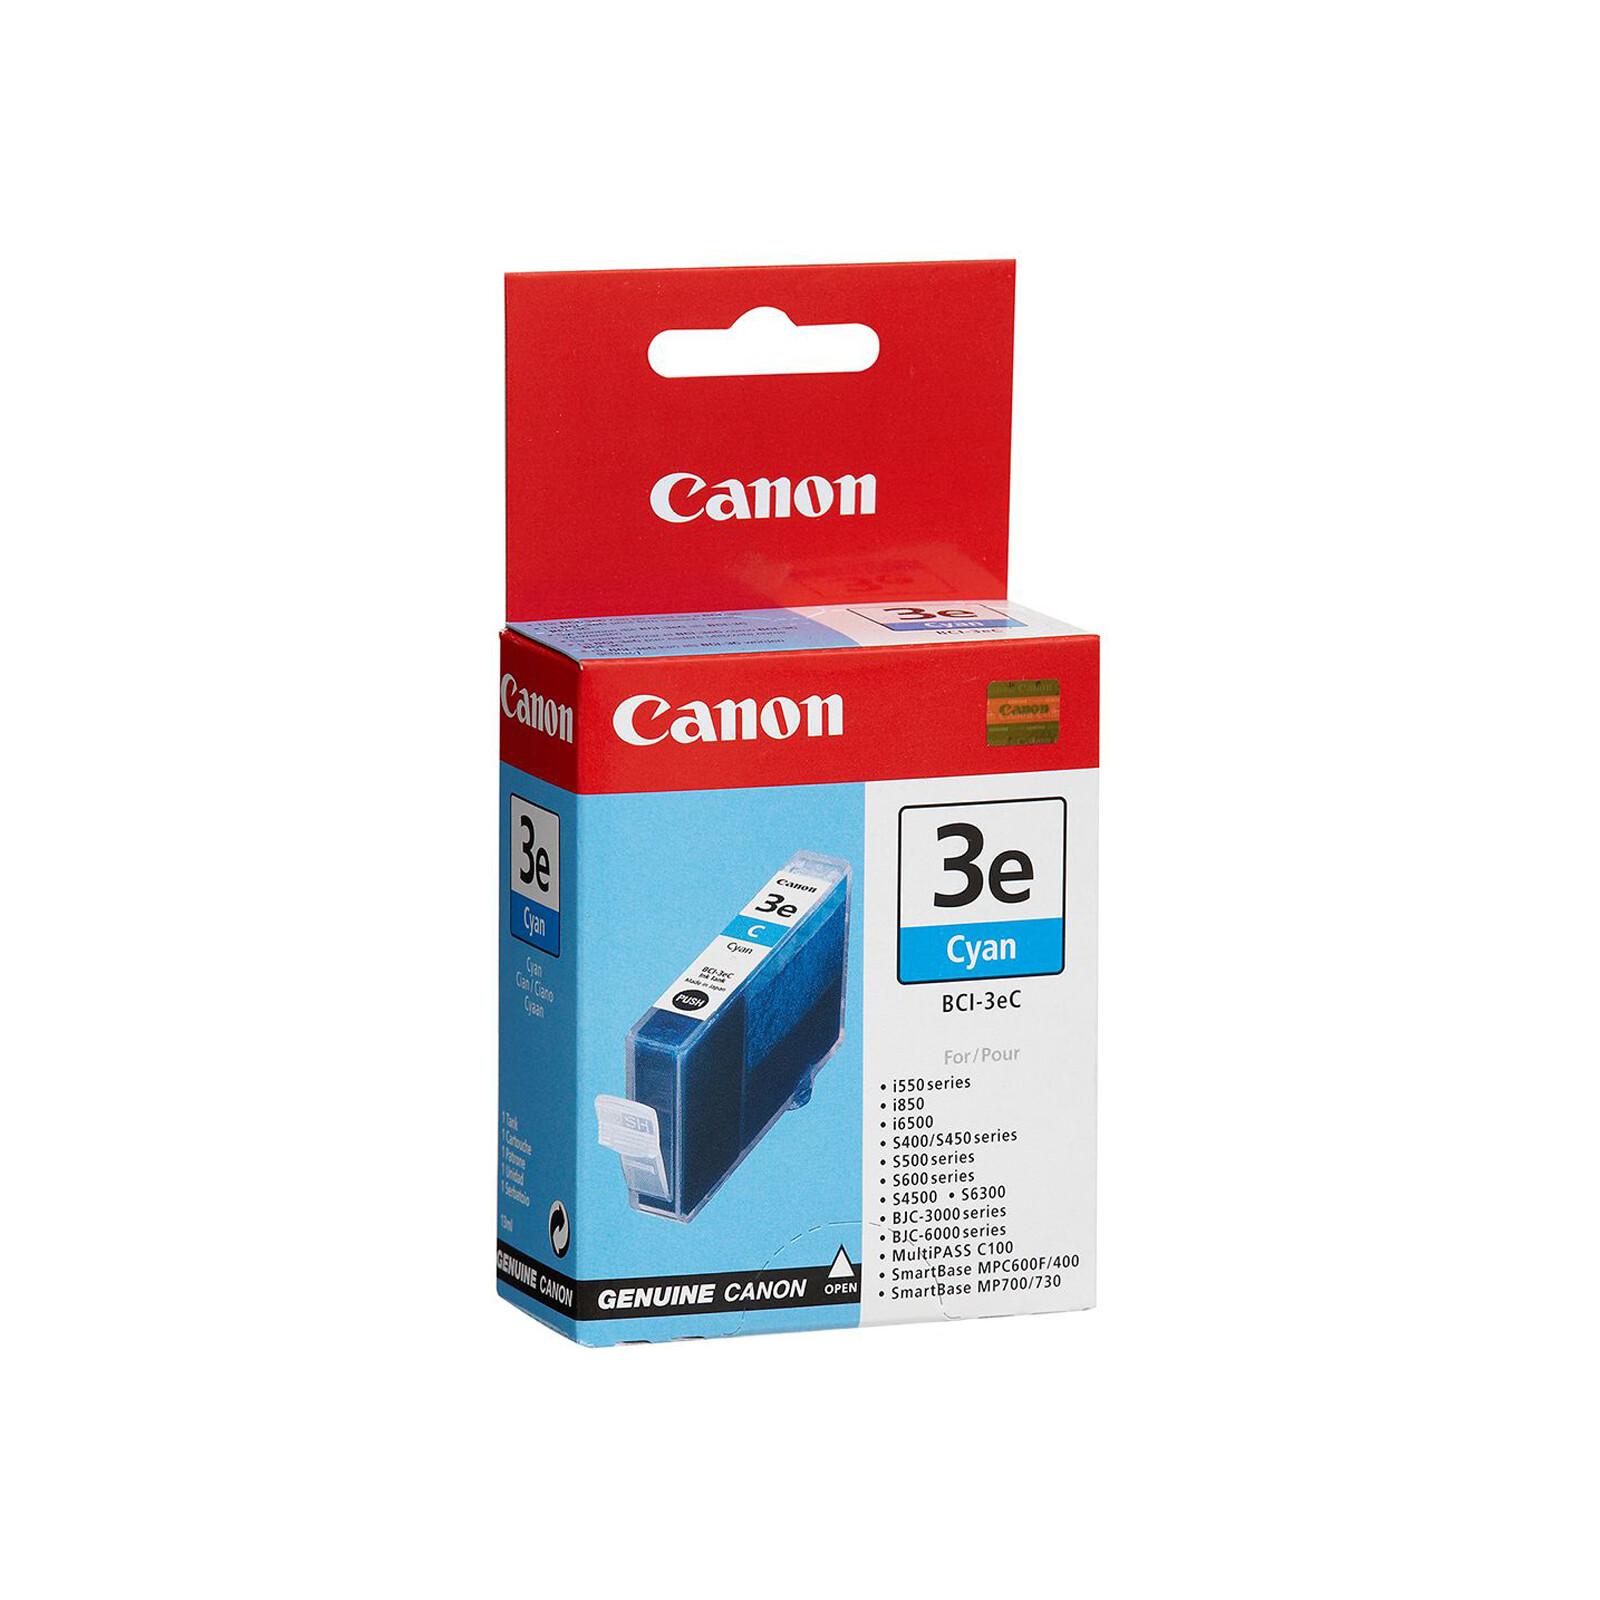 Canon BCI-3EC Tinte cyan